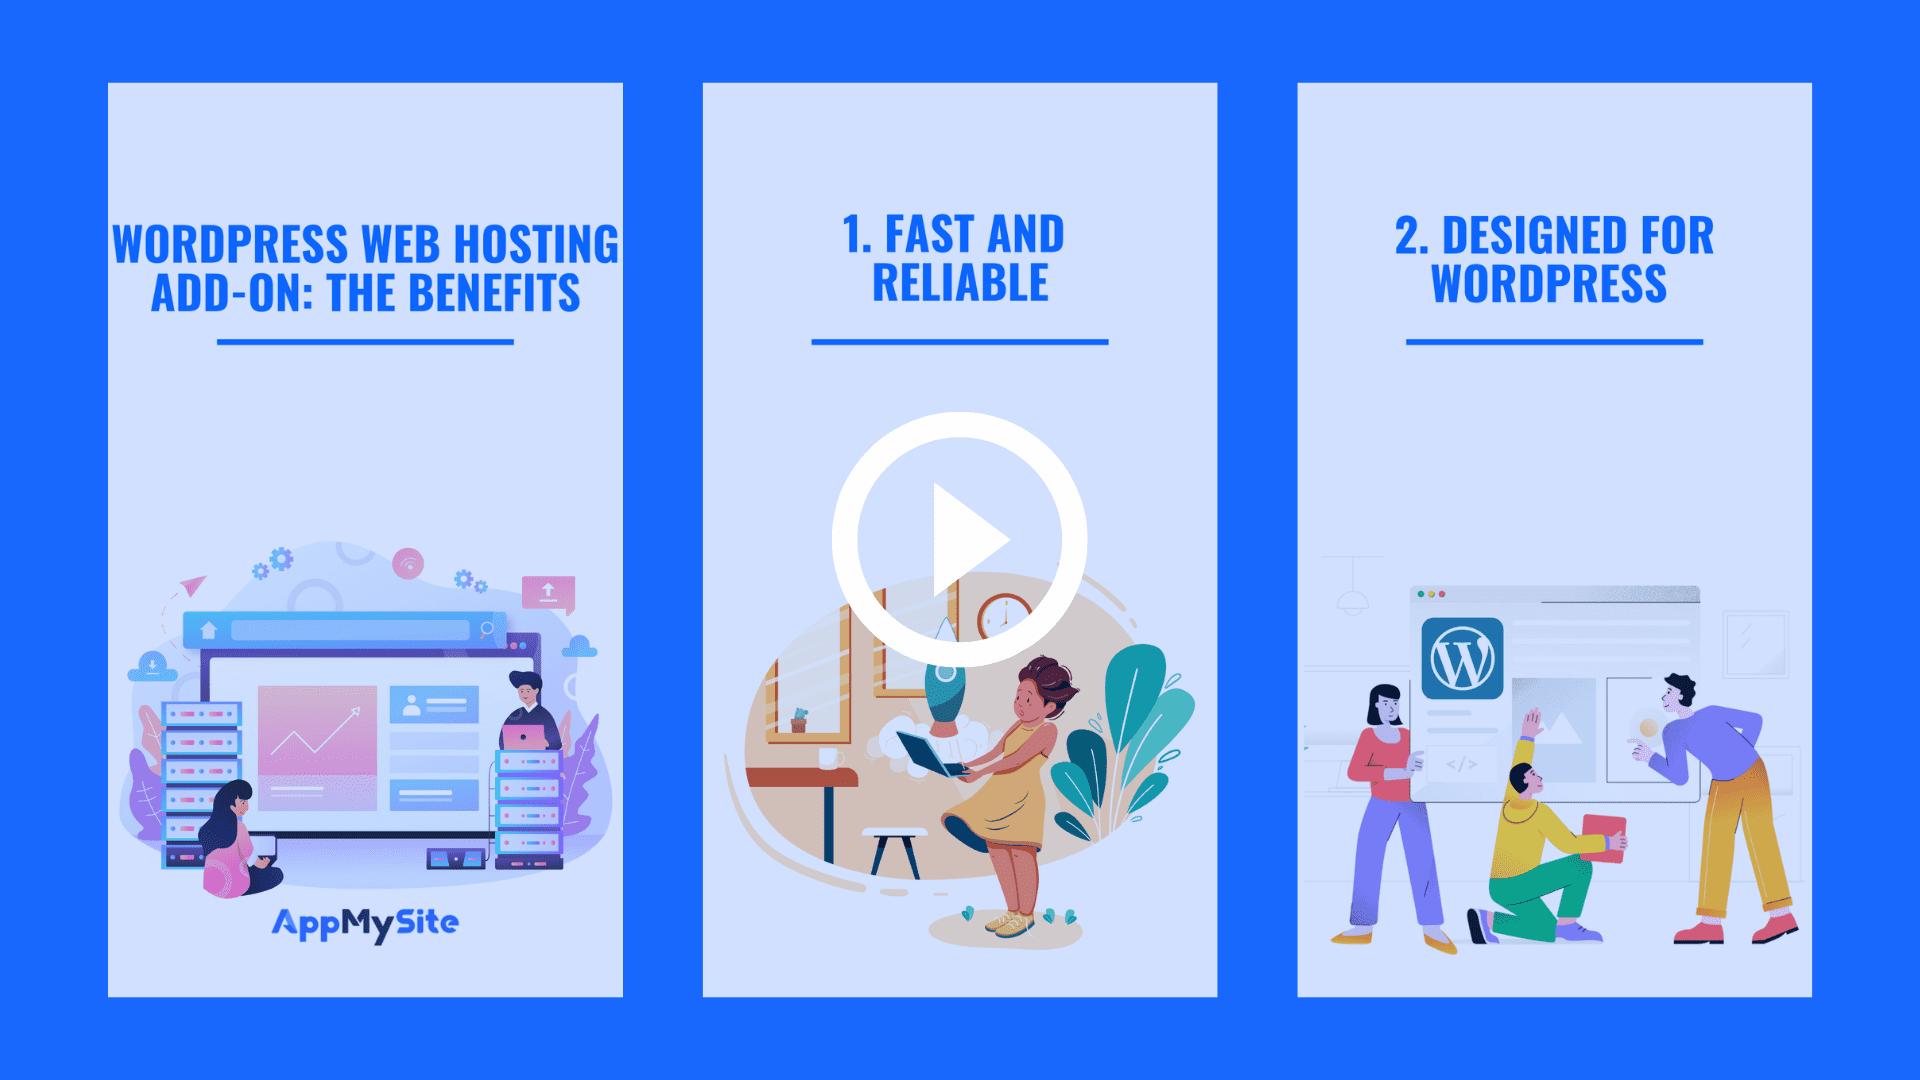 Wordpress web hosting add-on